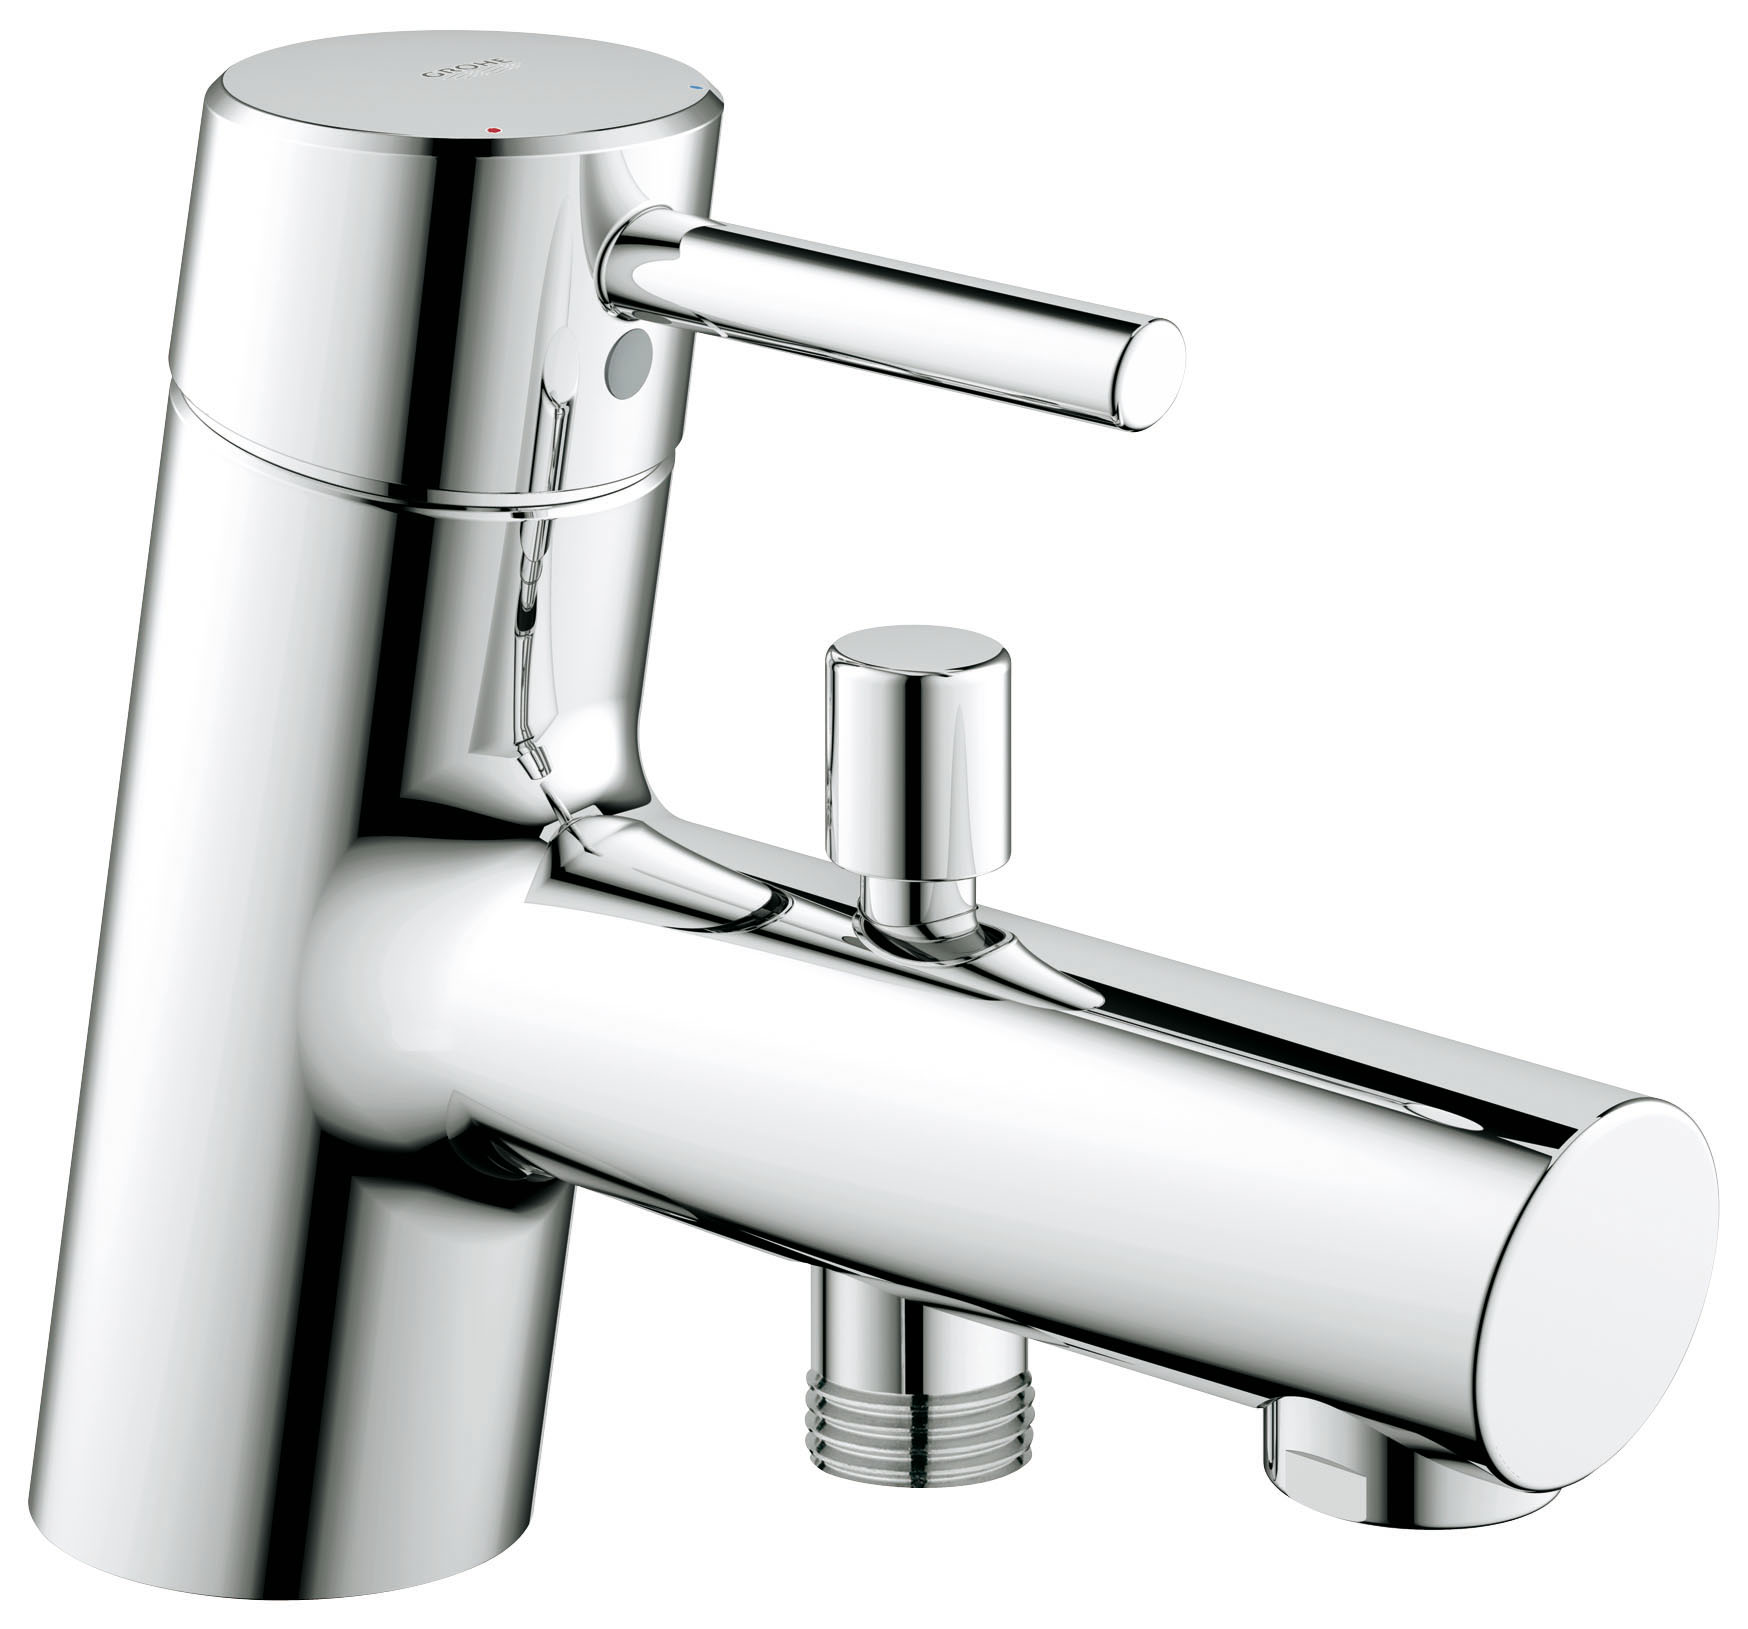 Смеситель на борт ванны Grohe Concetto 32701001  цена и фото